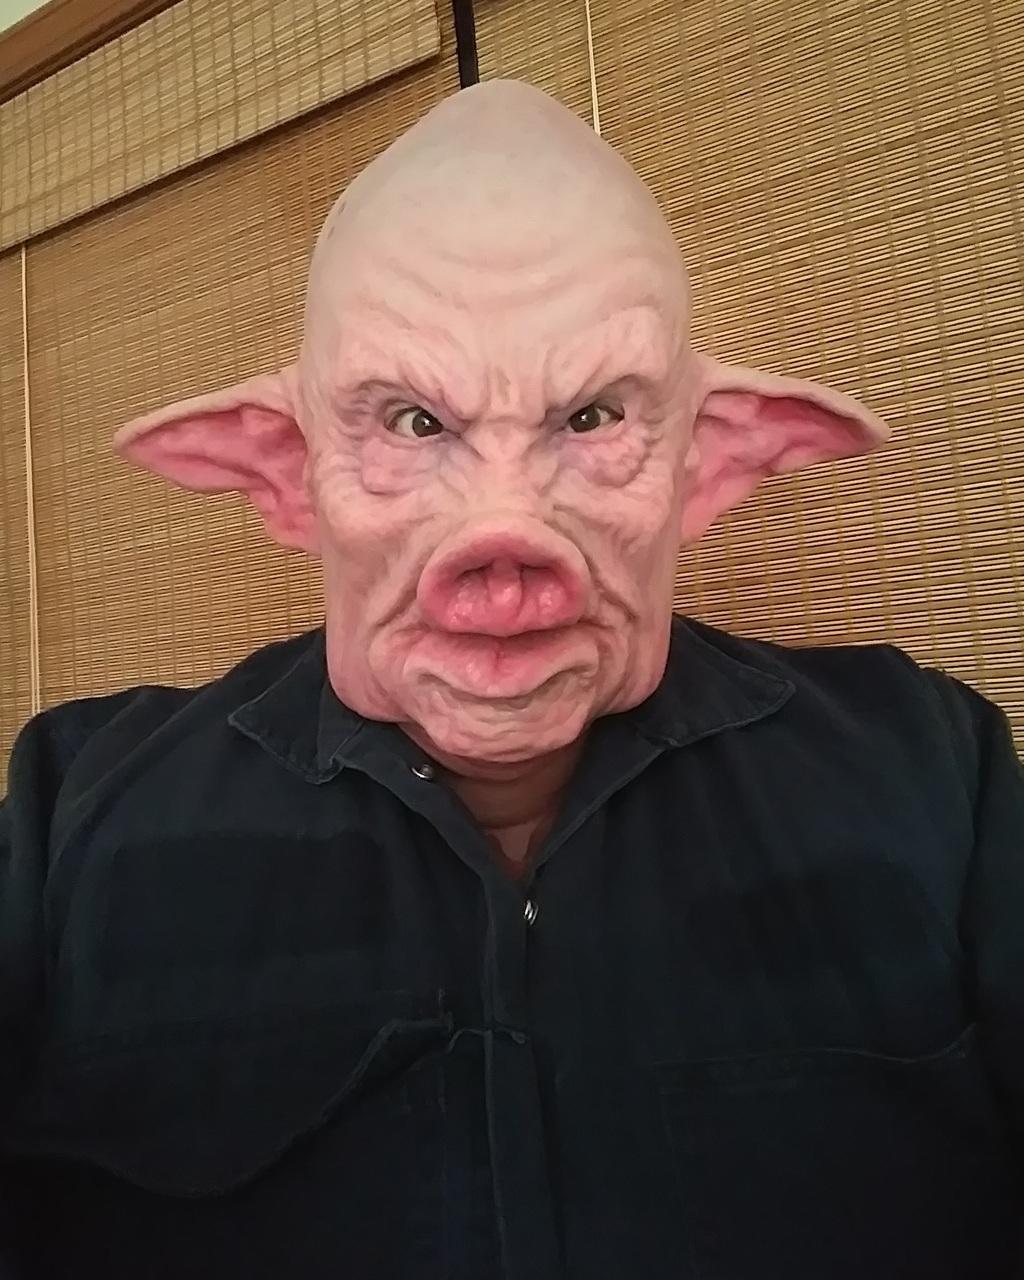 Most recent image: Boss Pig